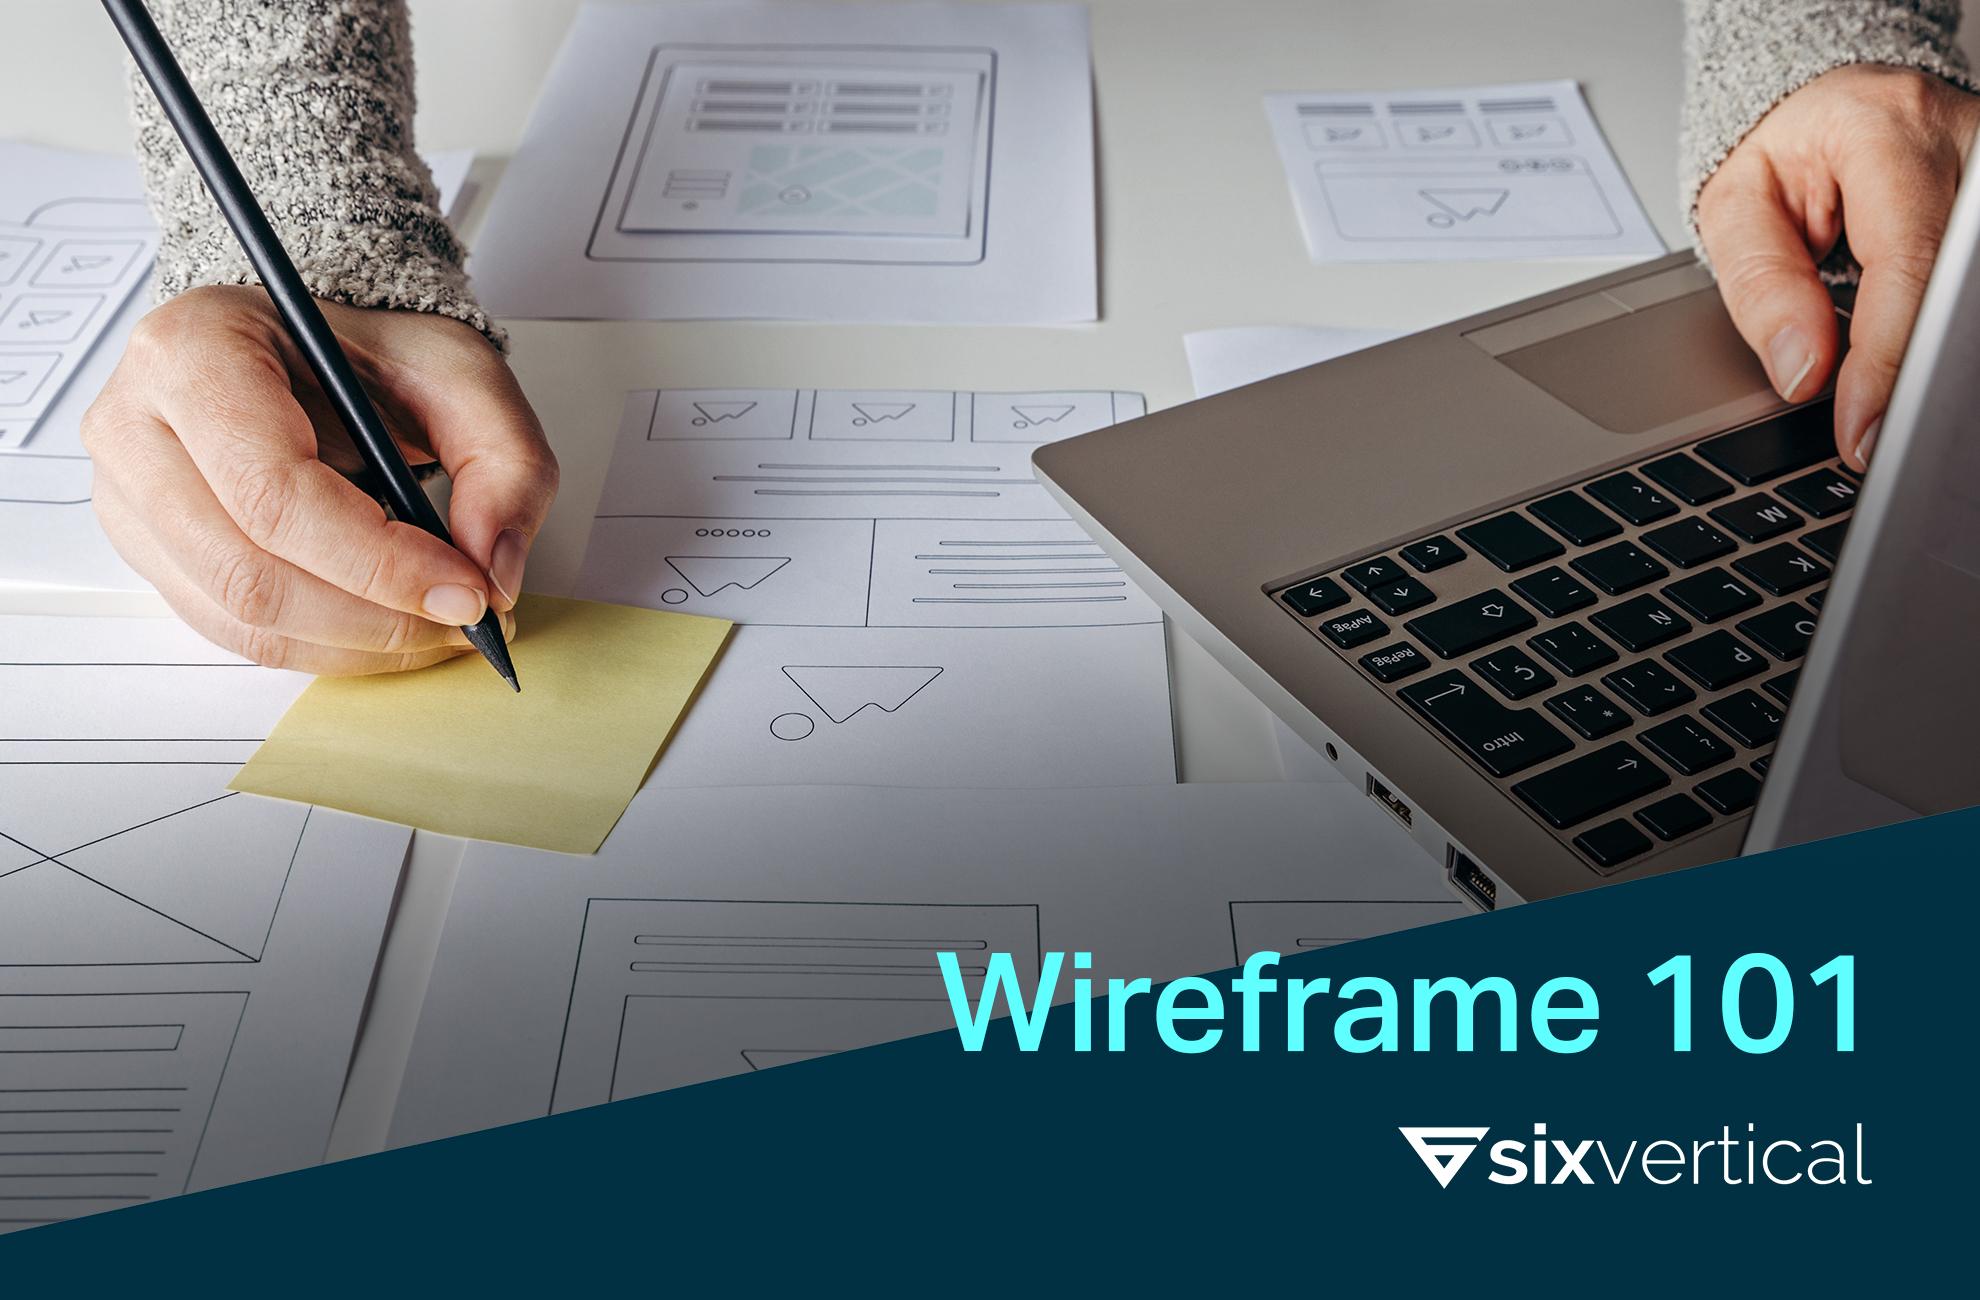 wireframe101_sq.jpg